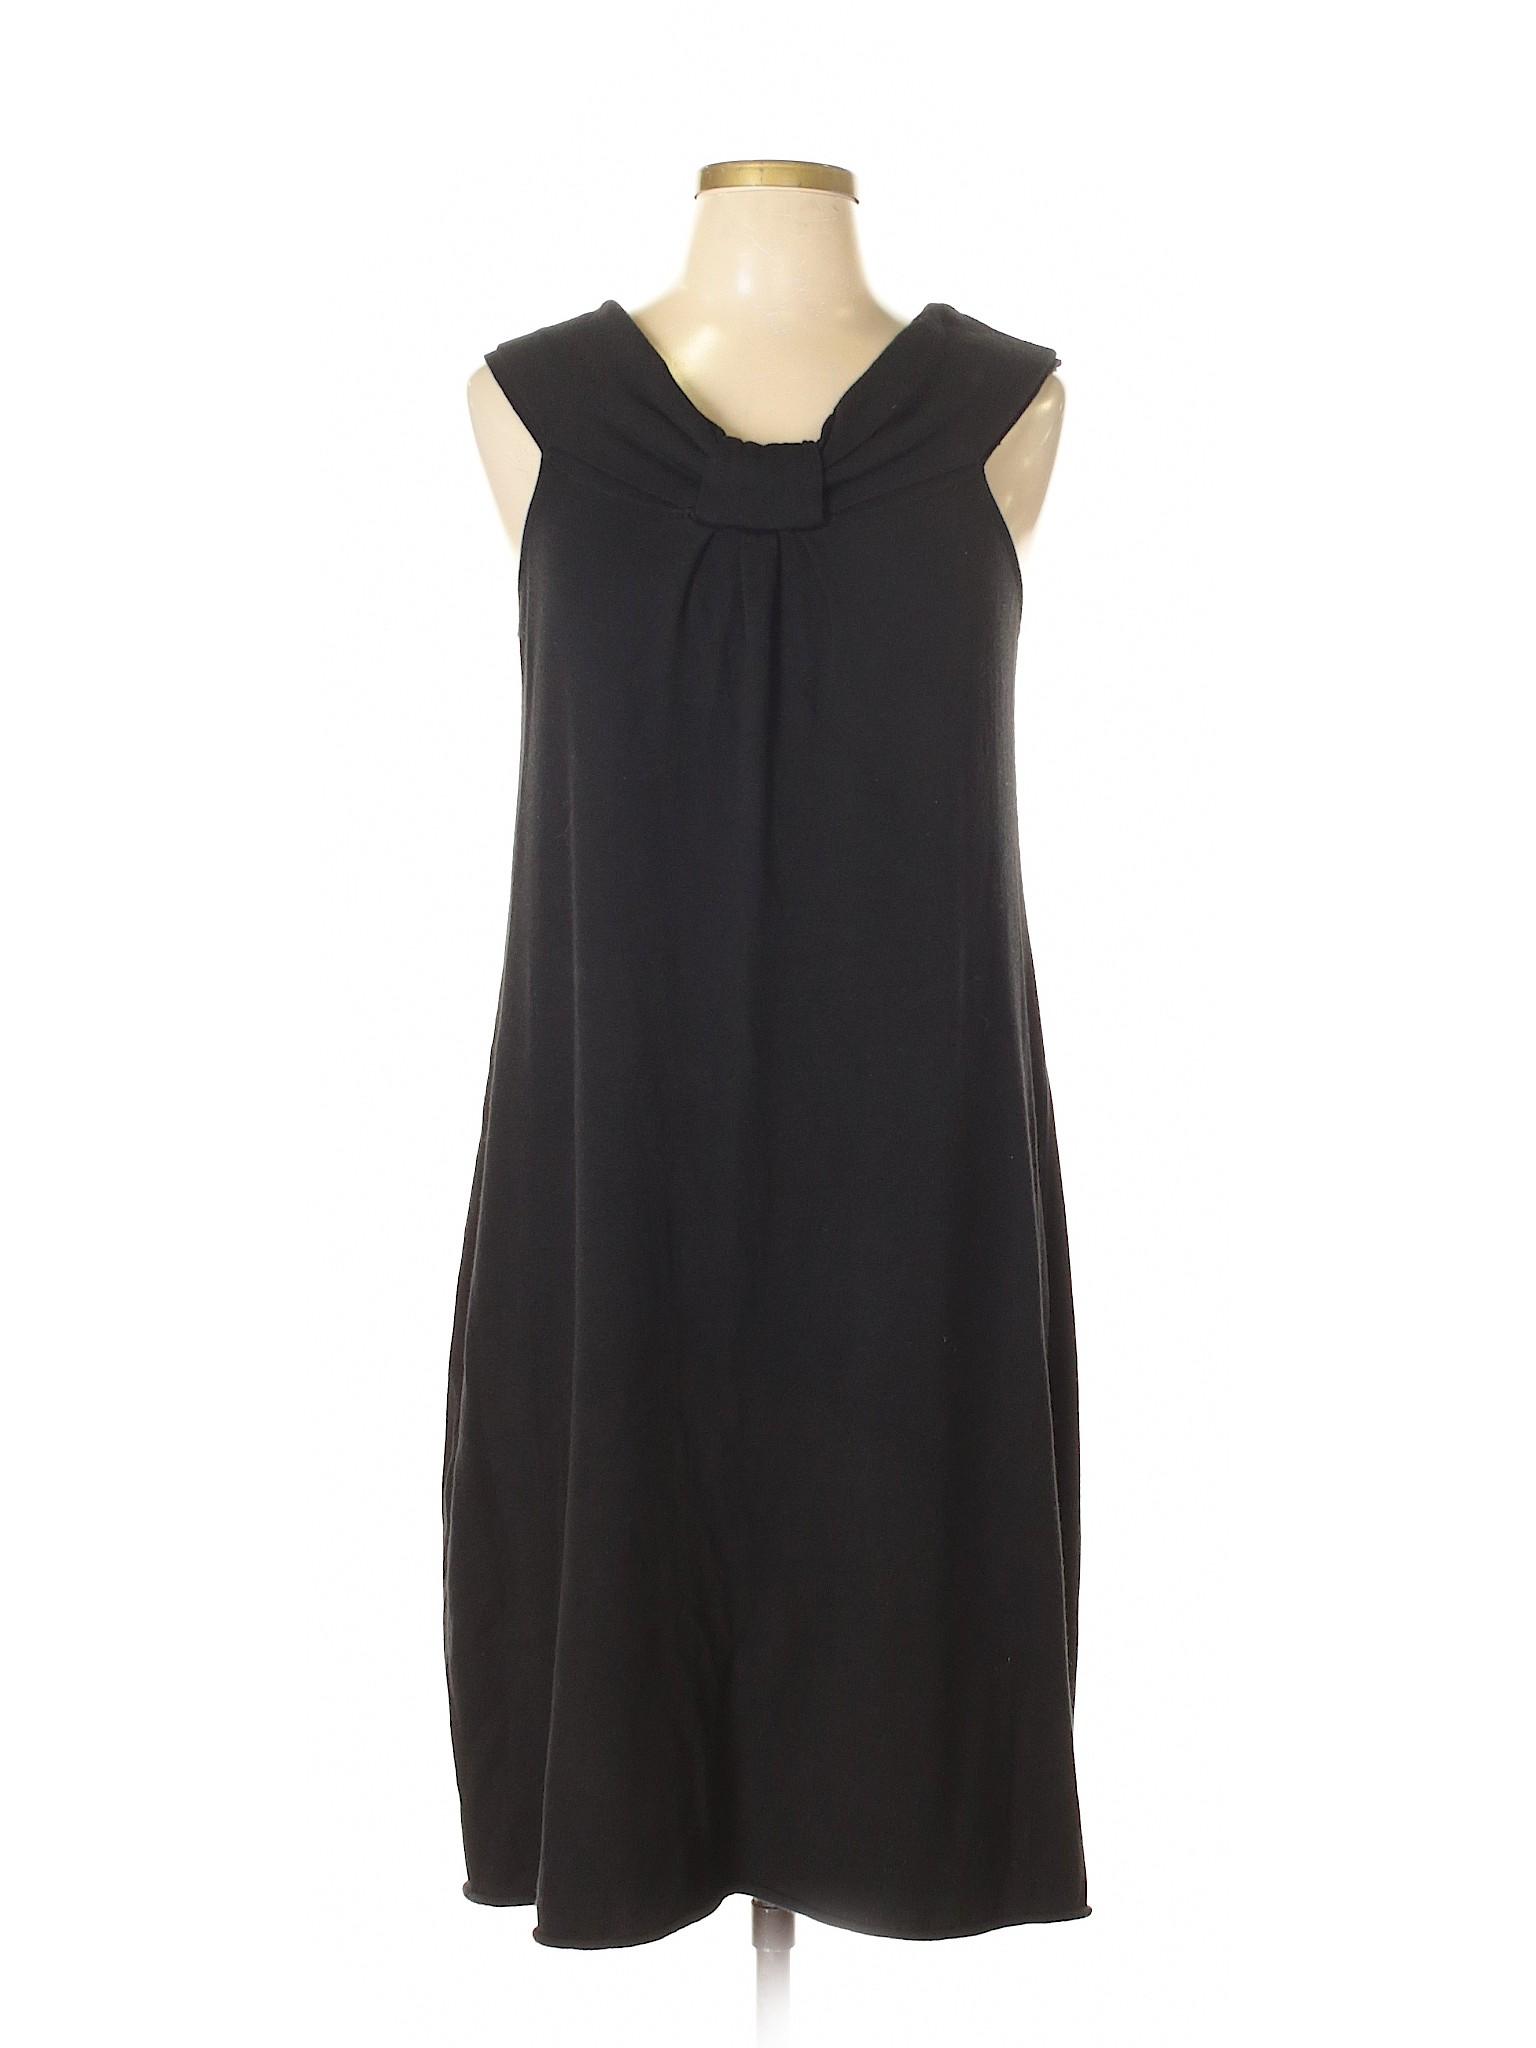 Boutique Casual Dress Winter Max Studio 7Awq0wXZ8